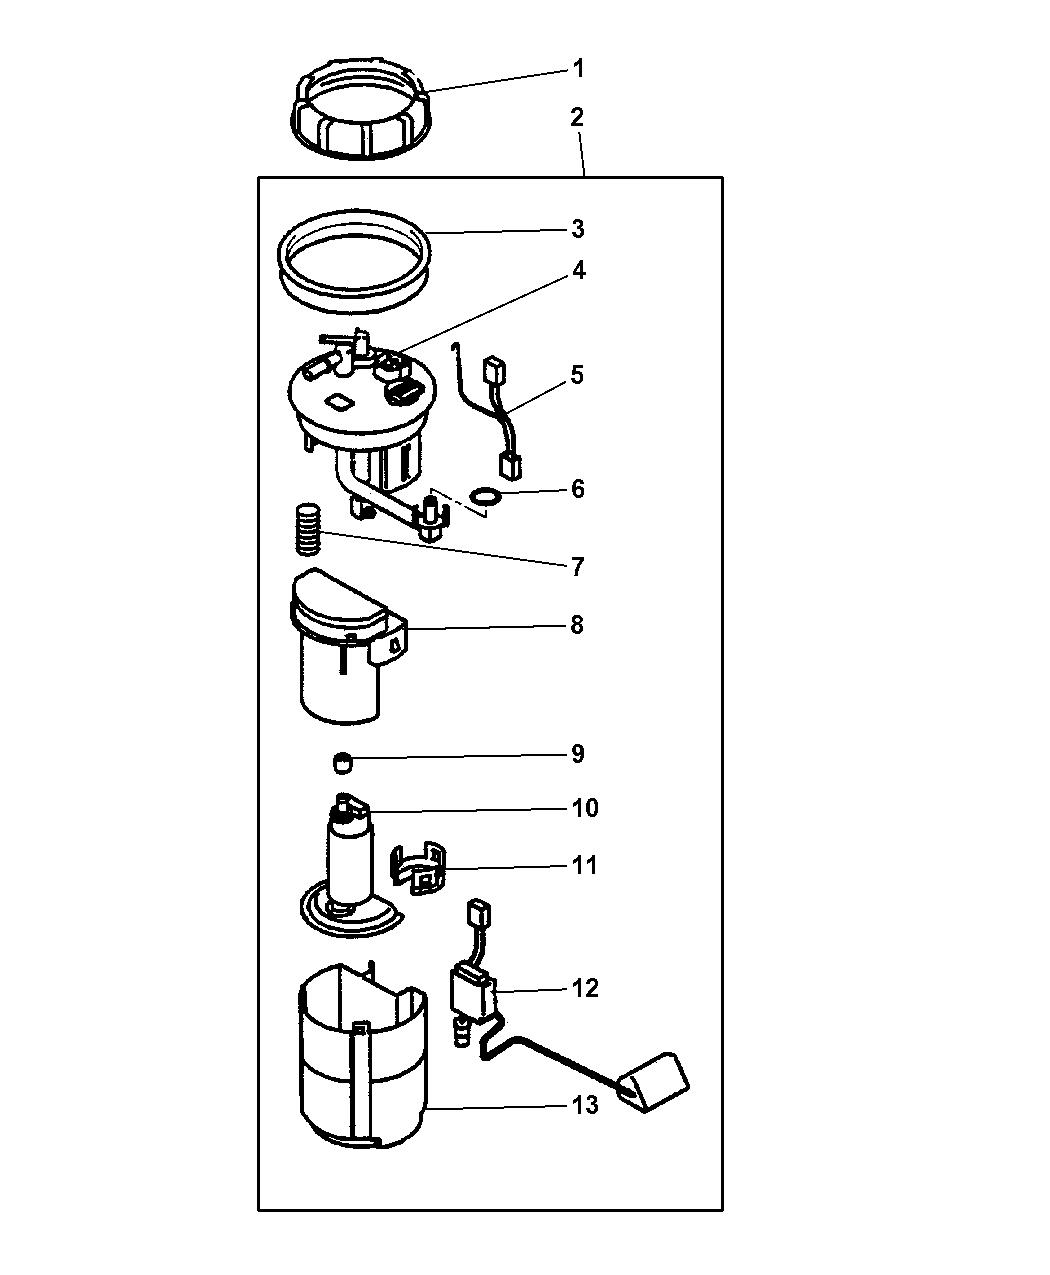 2001 Chrysler Sebring Coupe Fuel Pump & Sending Unit